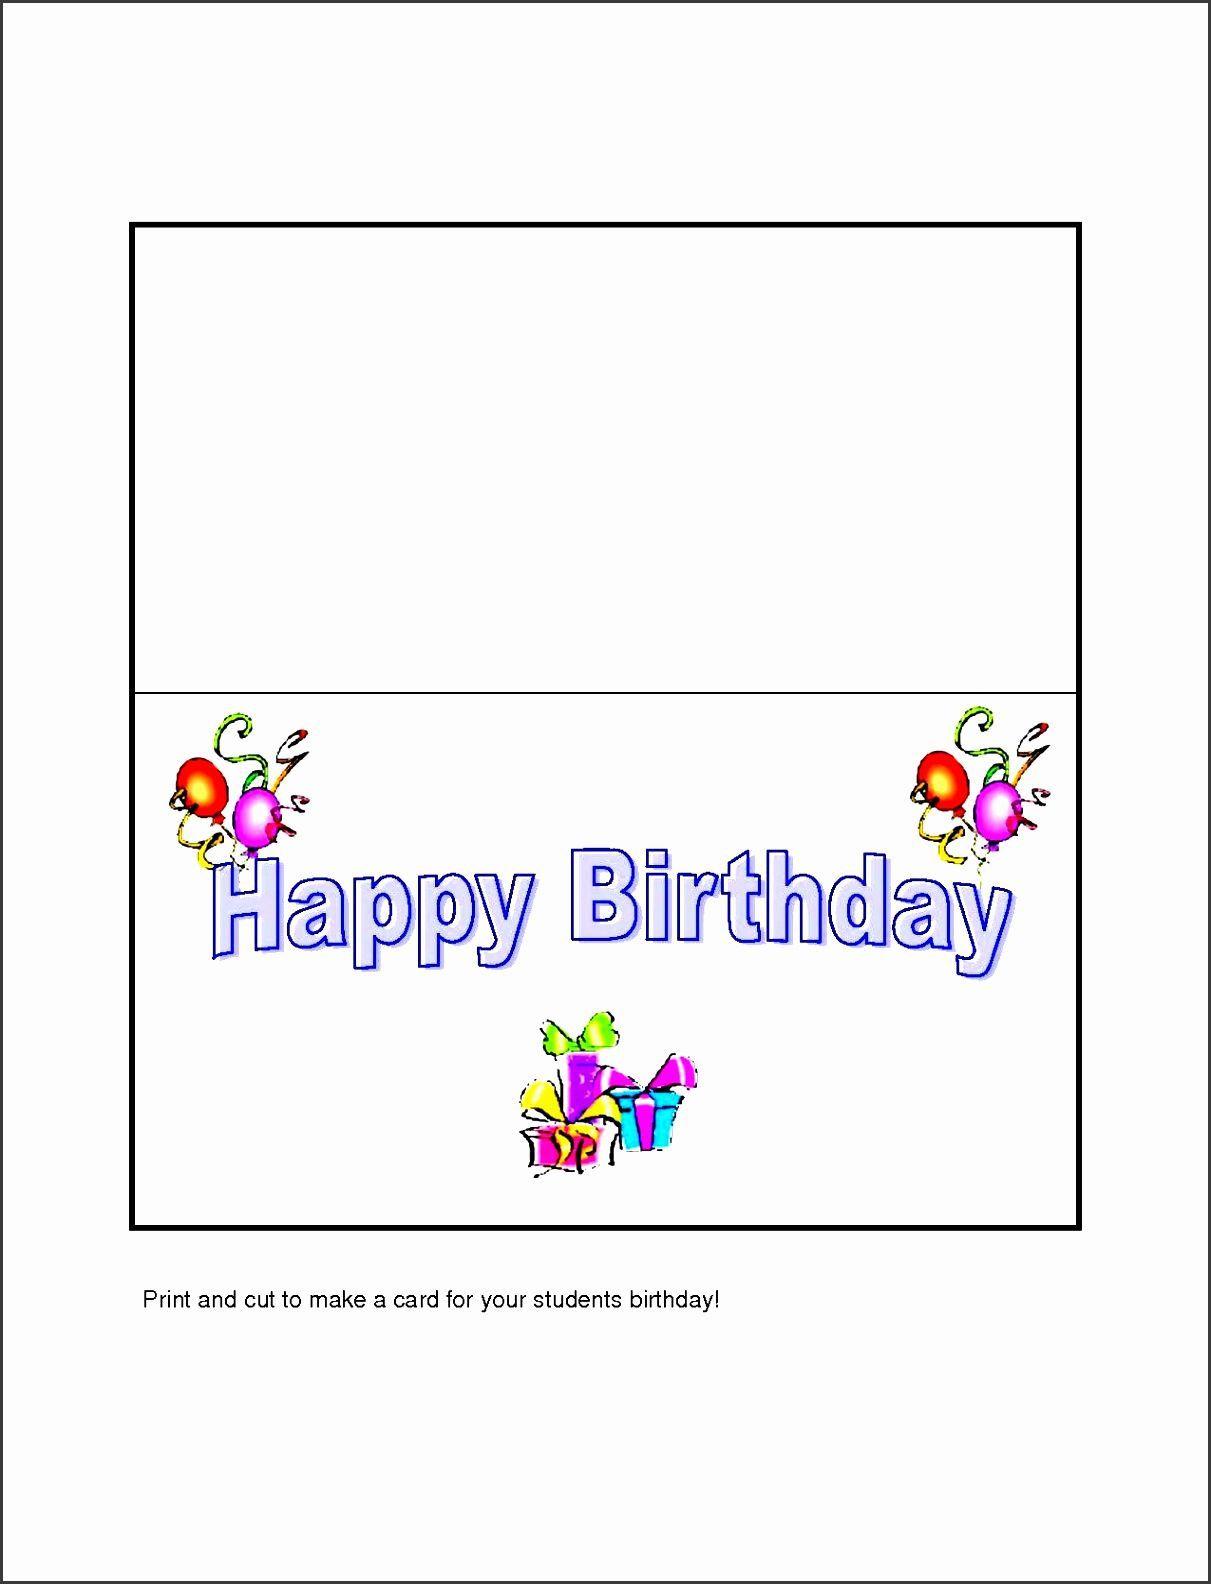 004 Singular Free Printable Card Template Word Idea  Blank Busines ForFull